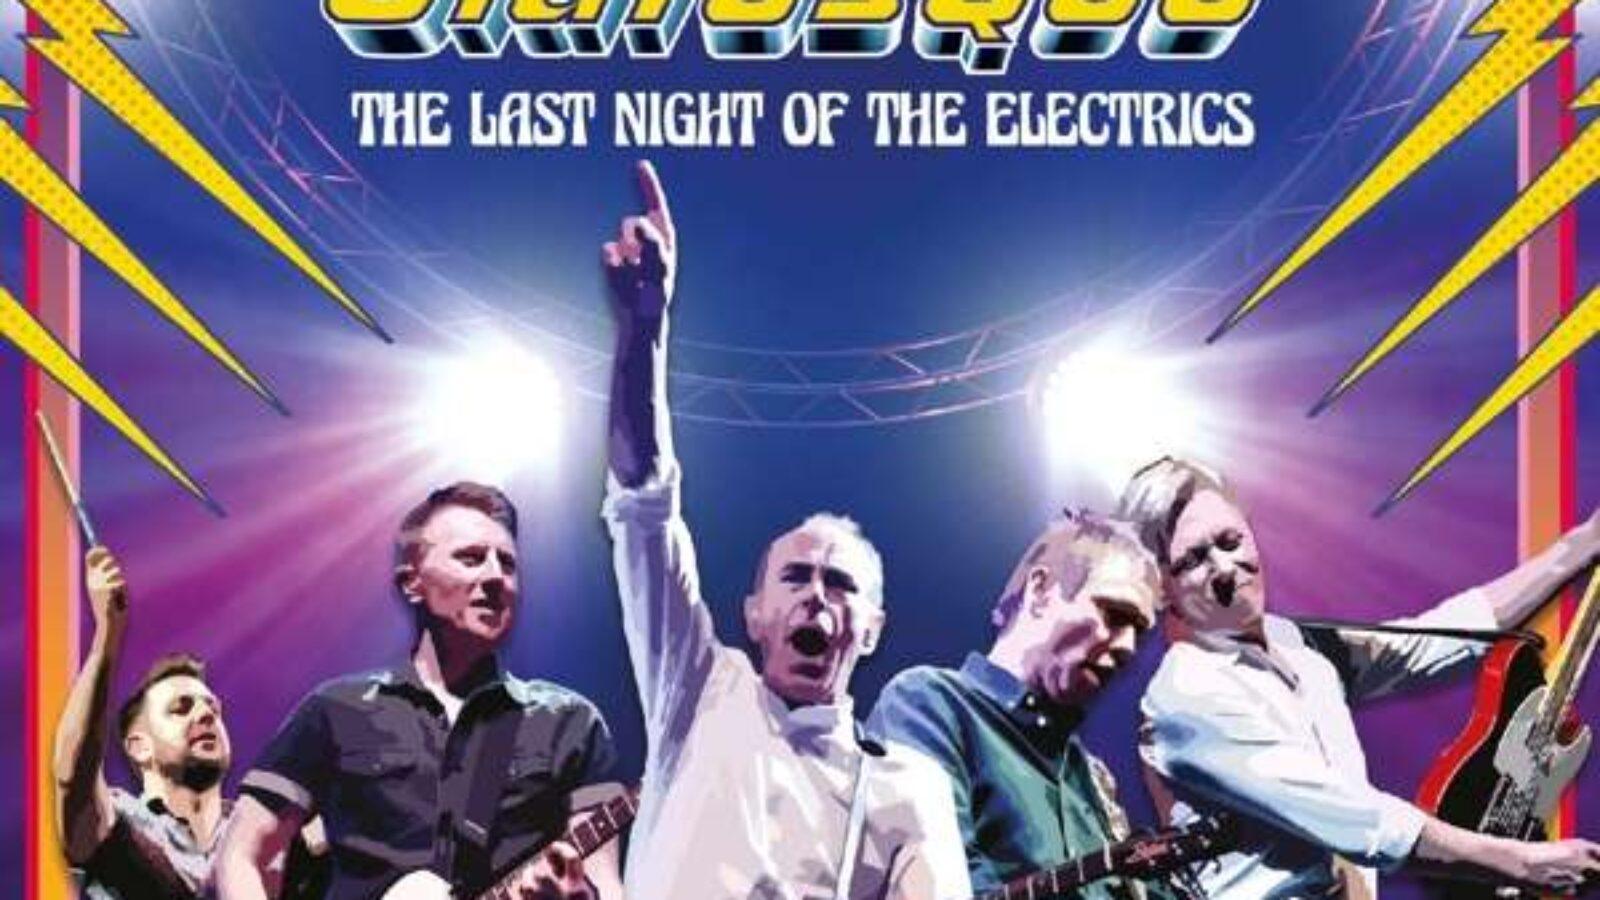 STATUS QUO The Last Night Of The Electrics